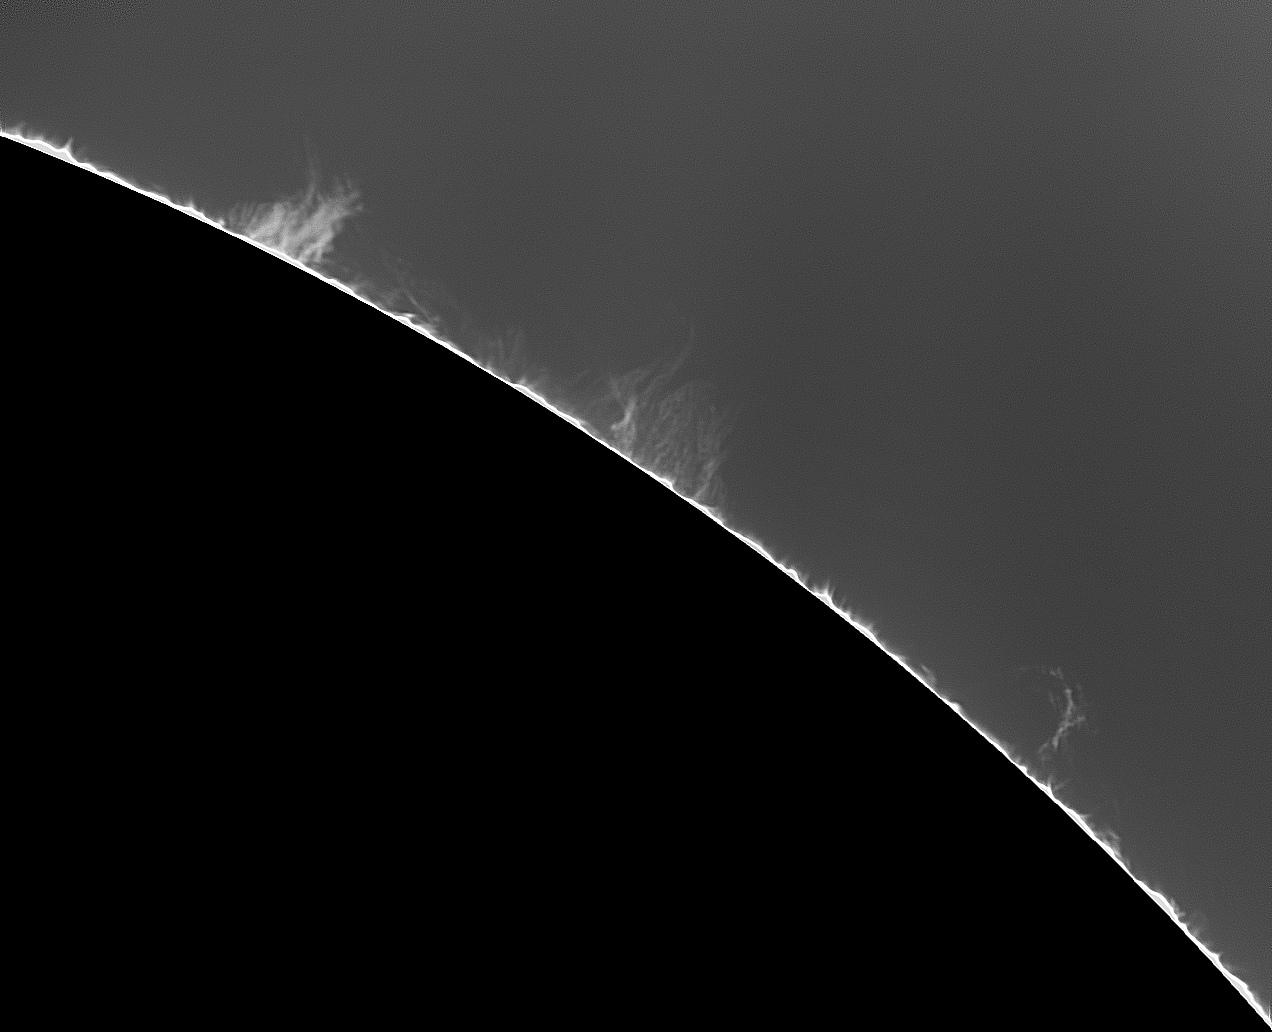 soleil-10dec19-b.jpg